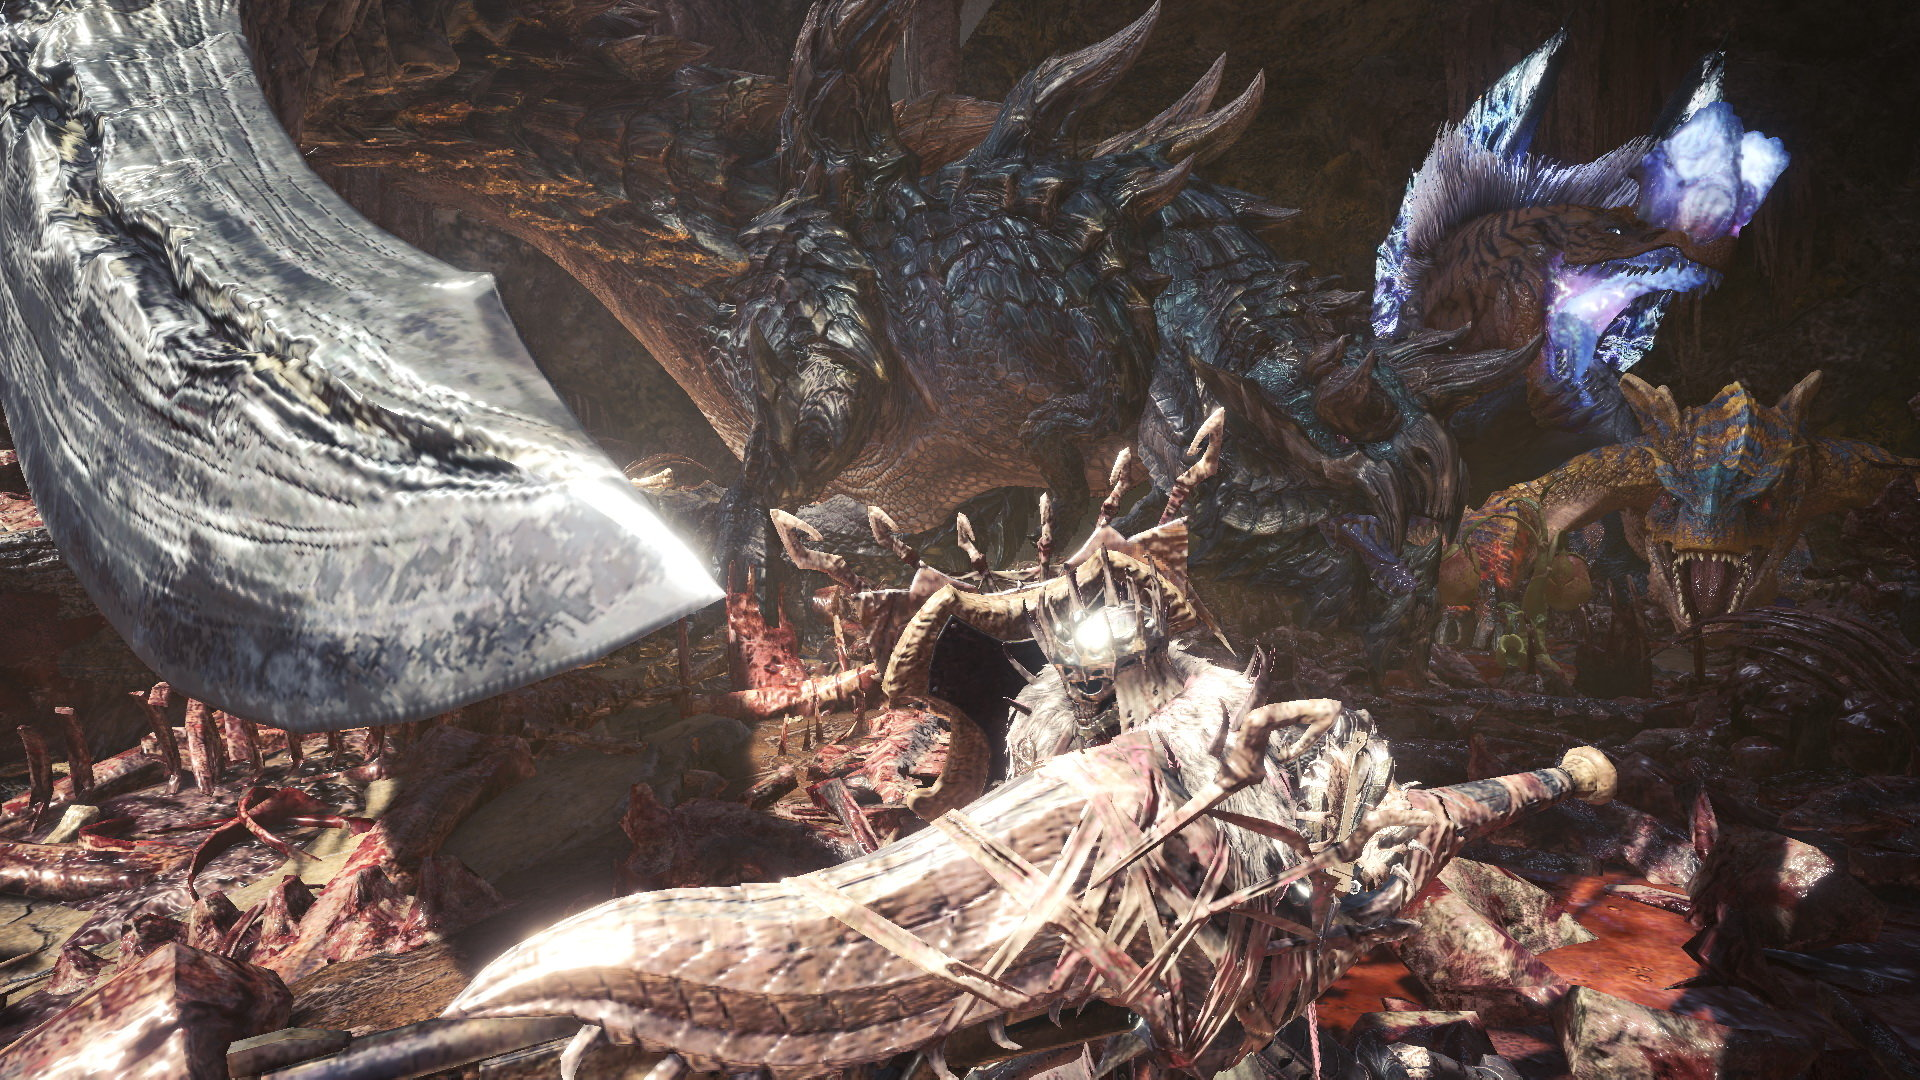 PS4《怪猎世界:冰原》活动任务预告 挑战强力怪物